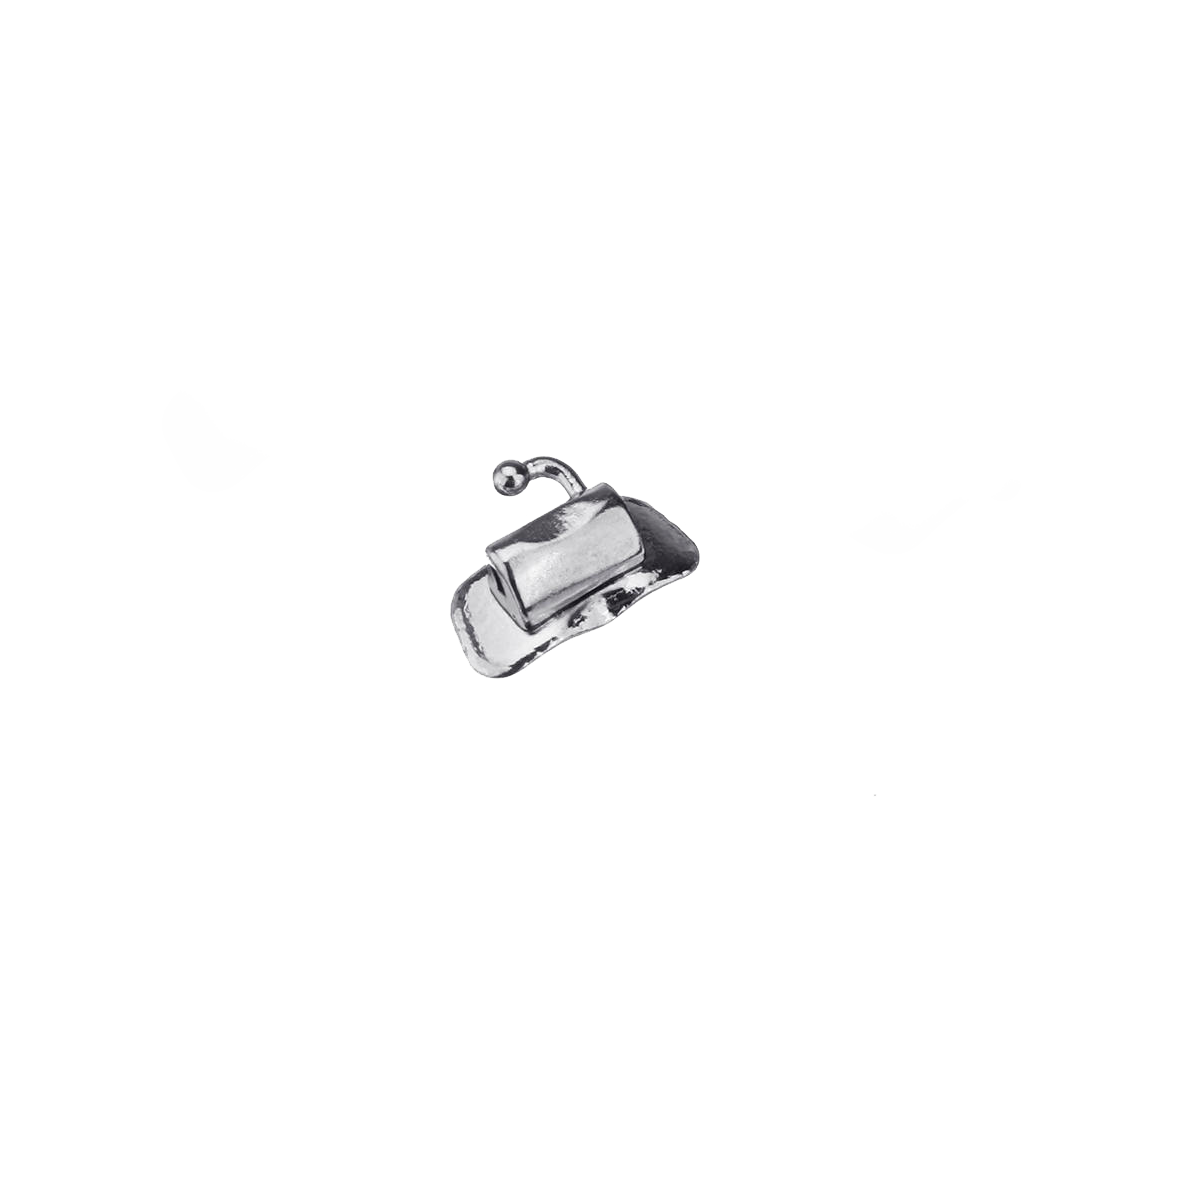 Buccal tube